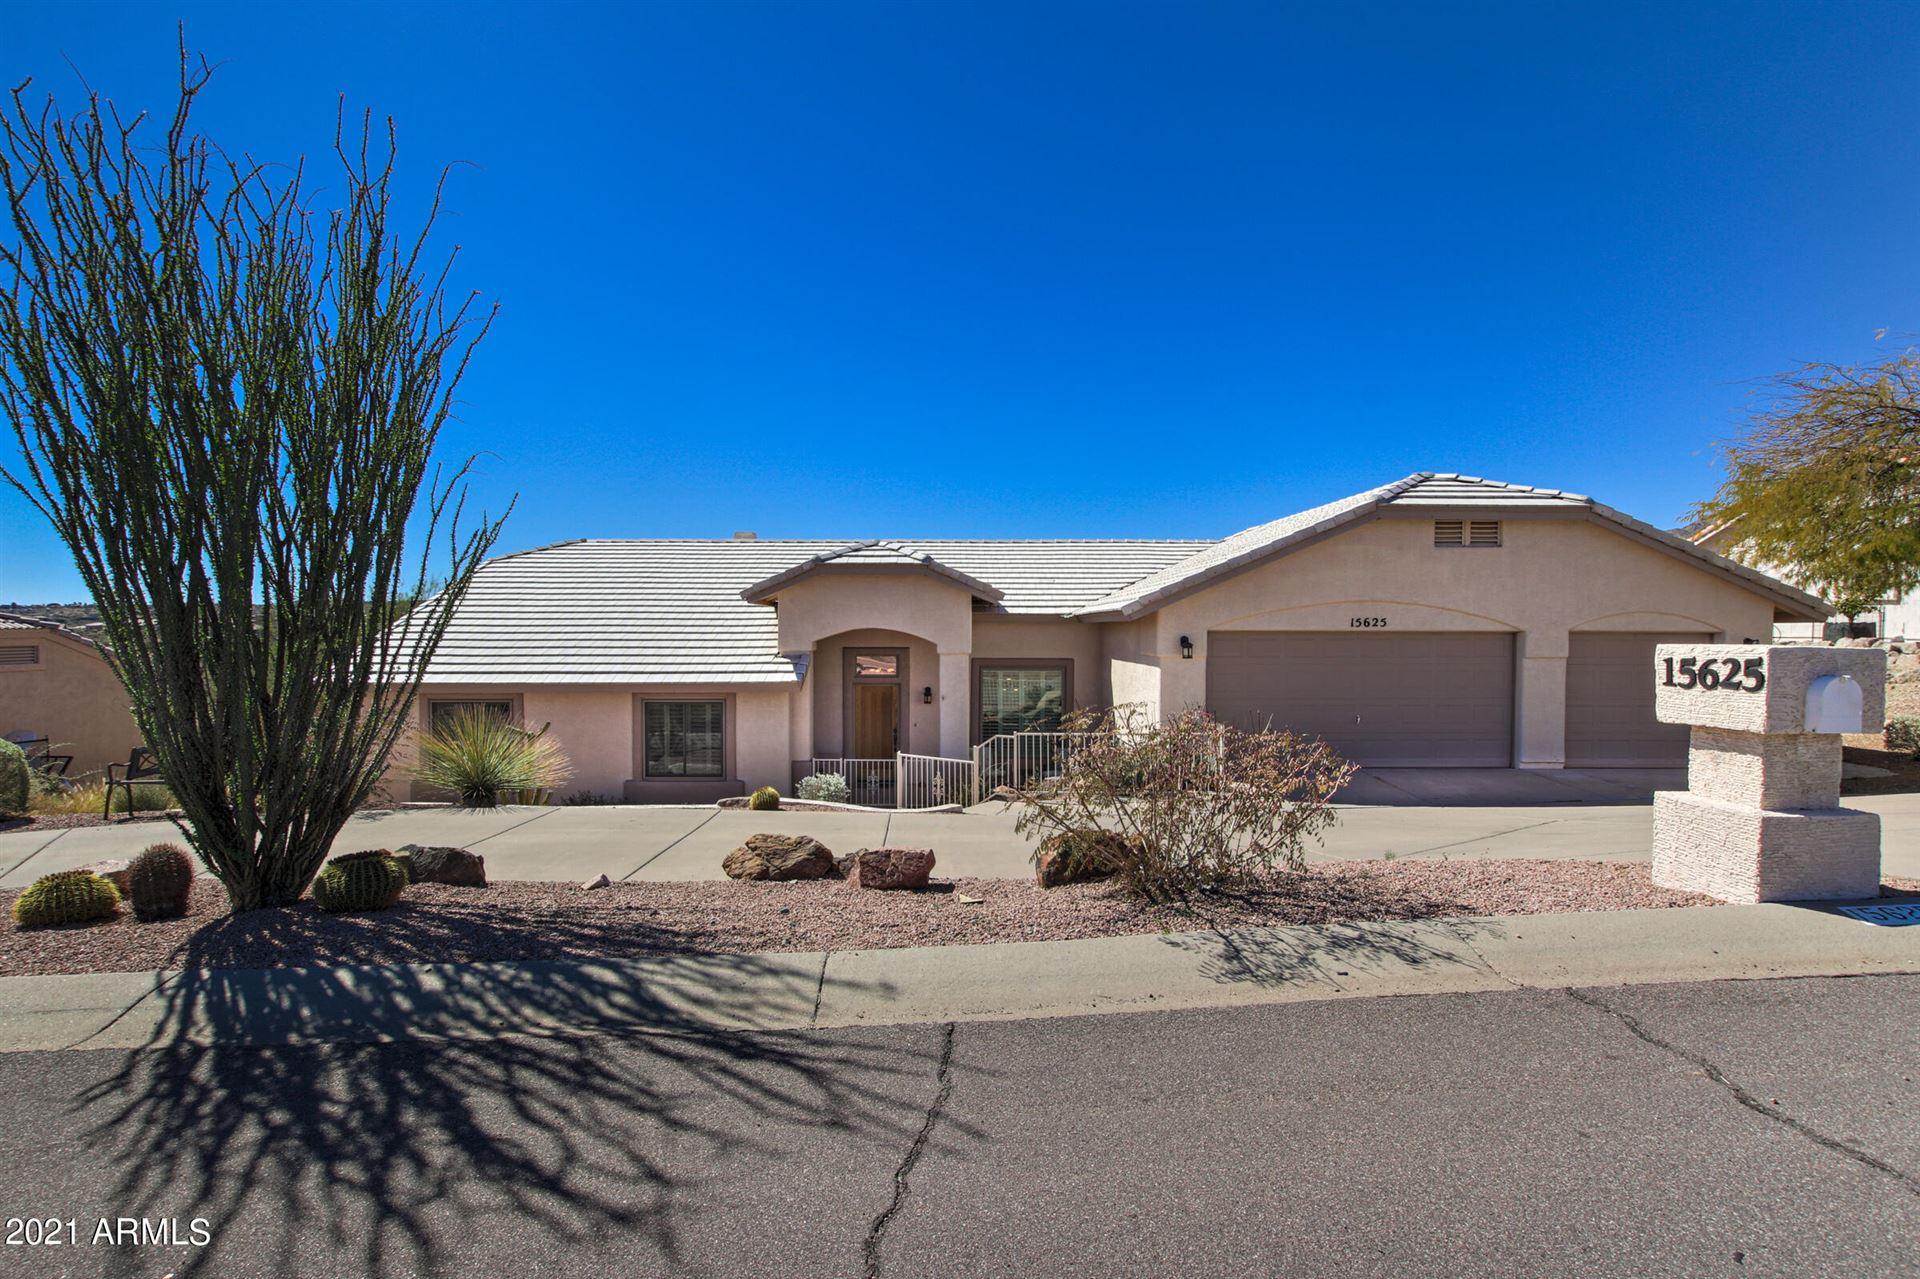 Photo of 15625 E GOLDEN EAGLE Boulevard, Fountain Hills, AZ 85268 (MLS # 6199086)